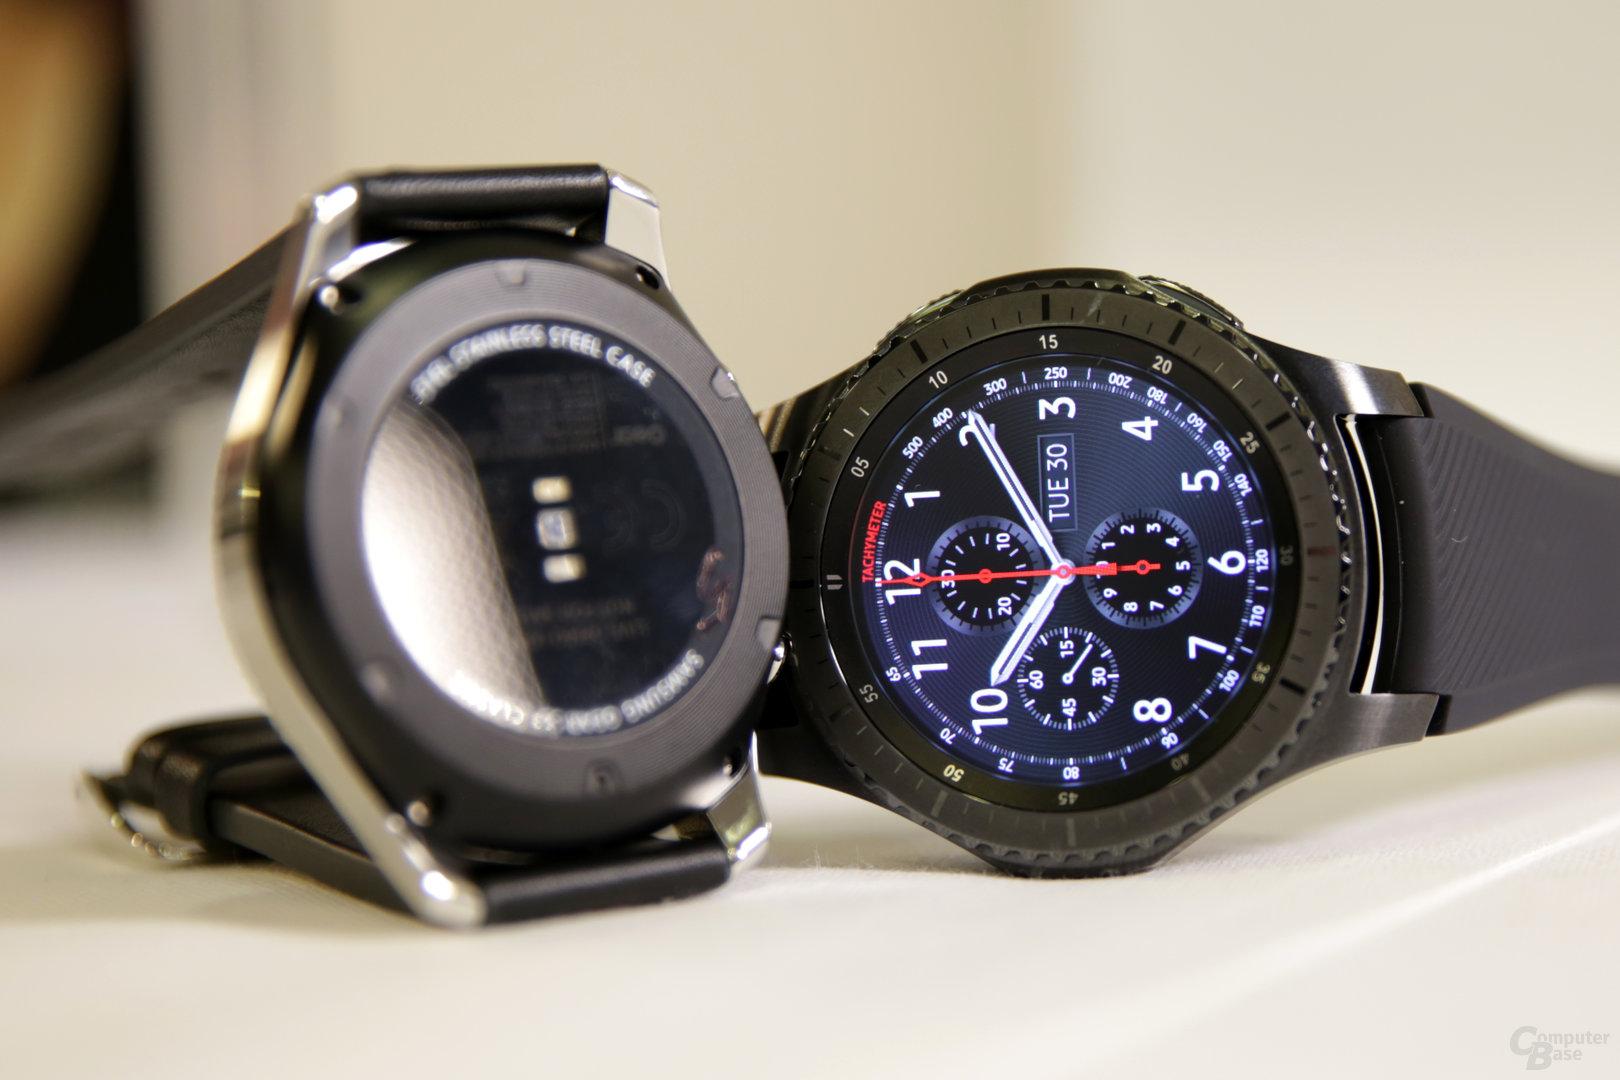 Rückseite Gear S3 Classic (links) und Gear S3 Frontier